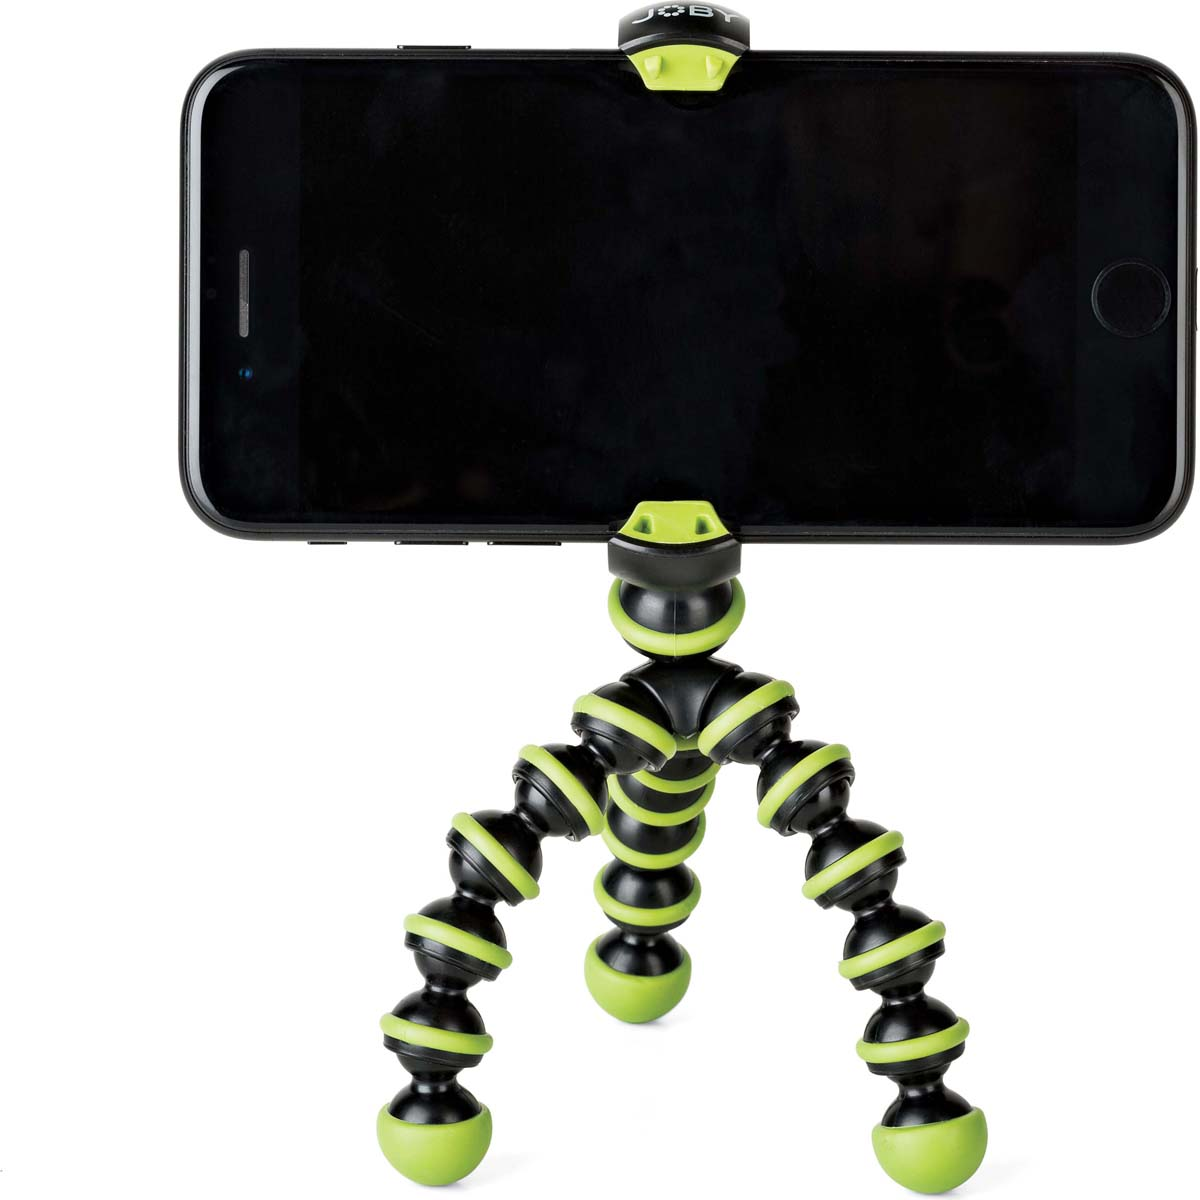 Joby GorillaPod Mobile Mini JB01519-0WW, Green штатив 8bitdo zero mini bluetooth gamepad for ios android windows pc